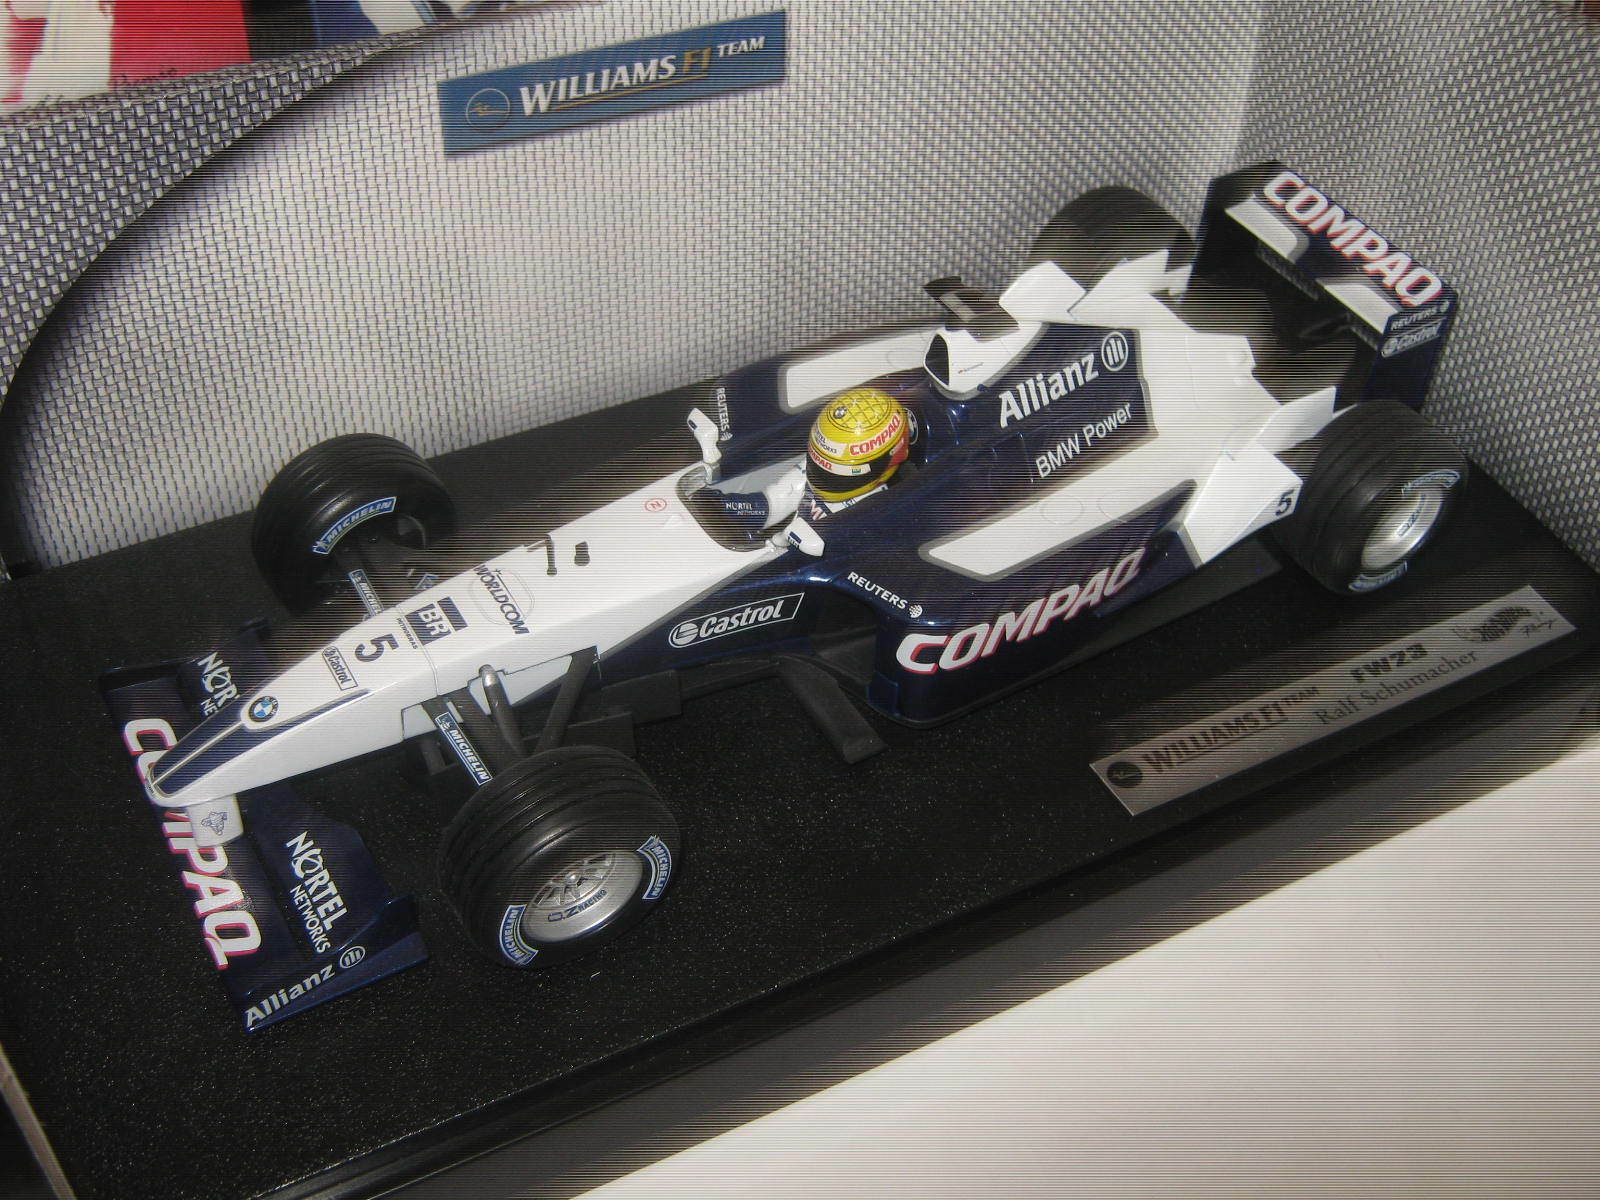 1 18 Williams Williams Williams BMW FW23 R. Schumacher 2001 HotwheelsF1 50200 OVP new 32c50e